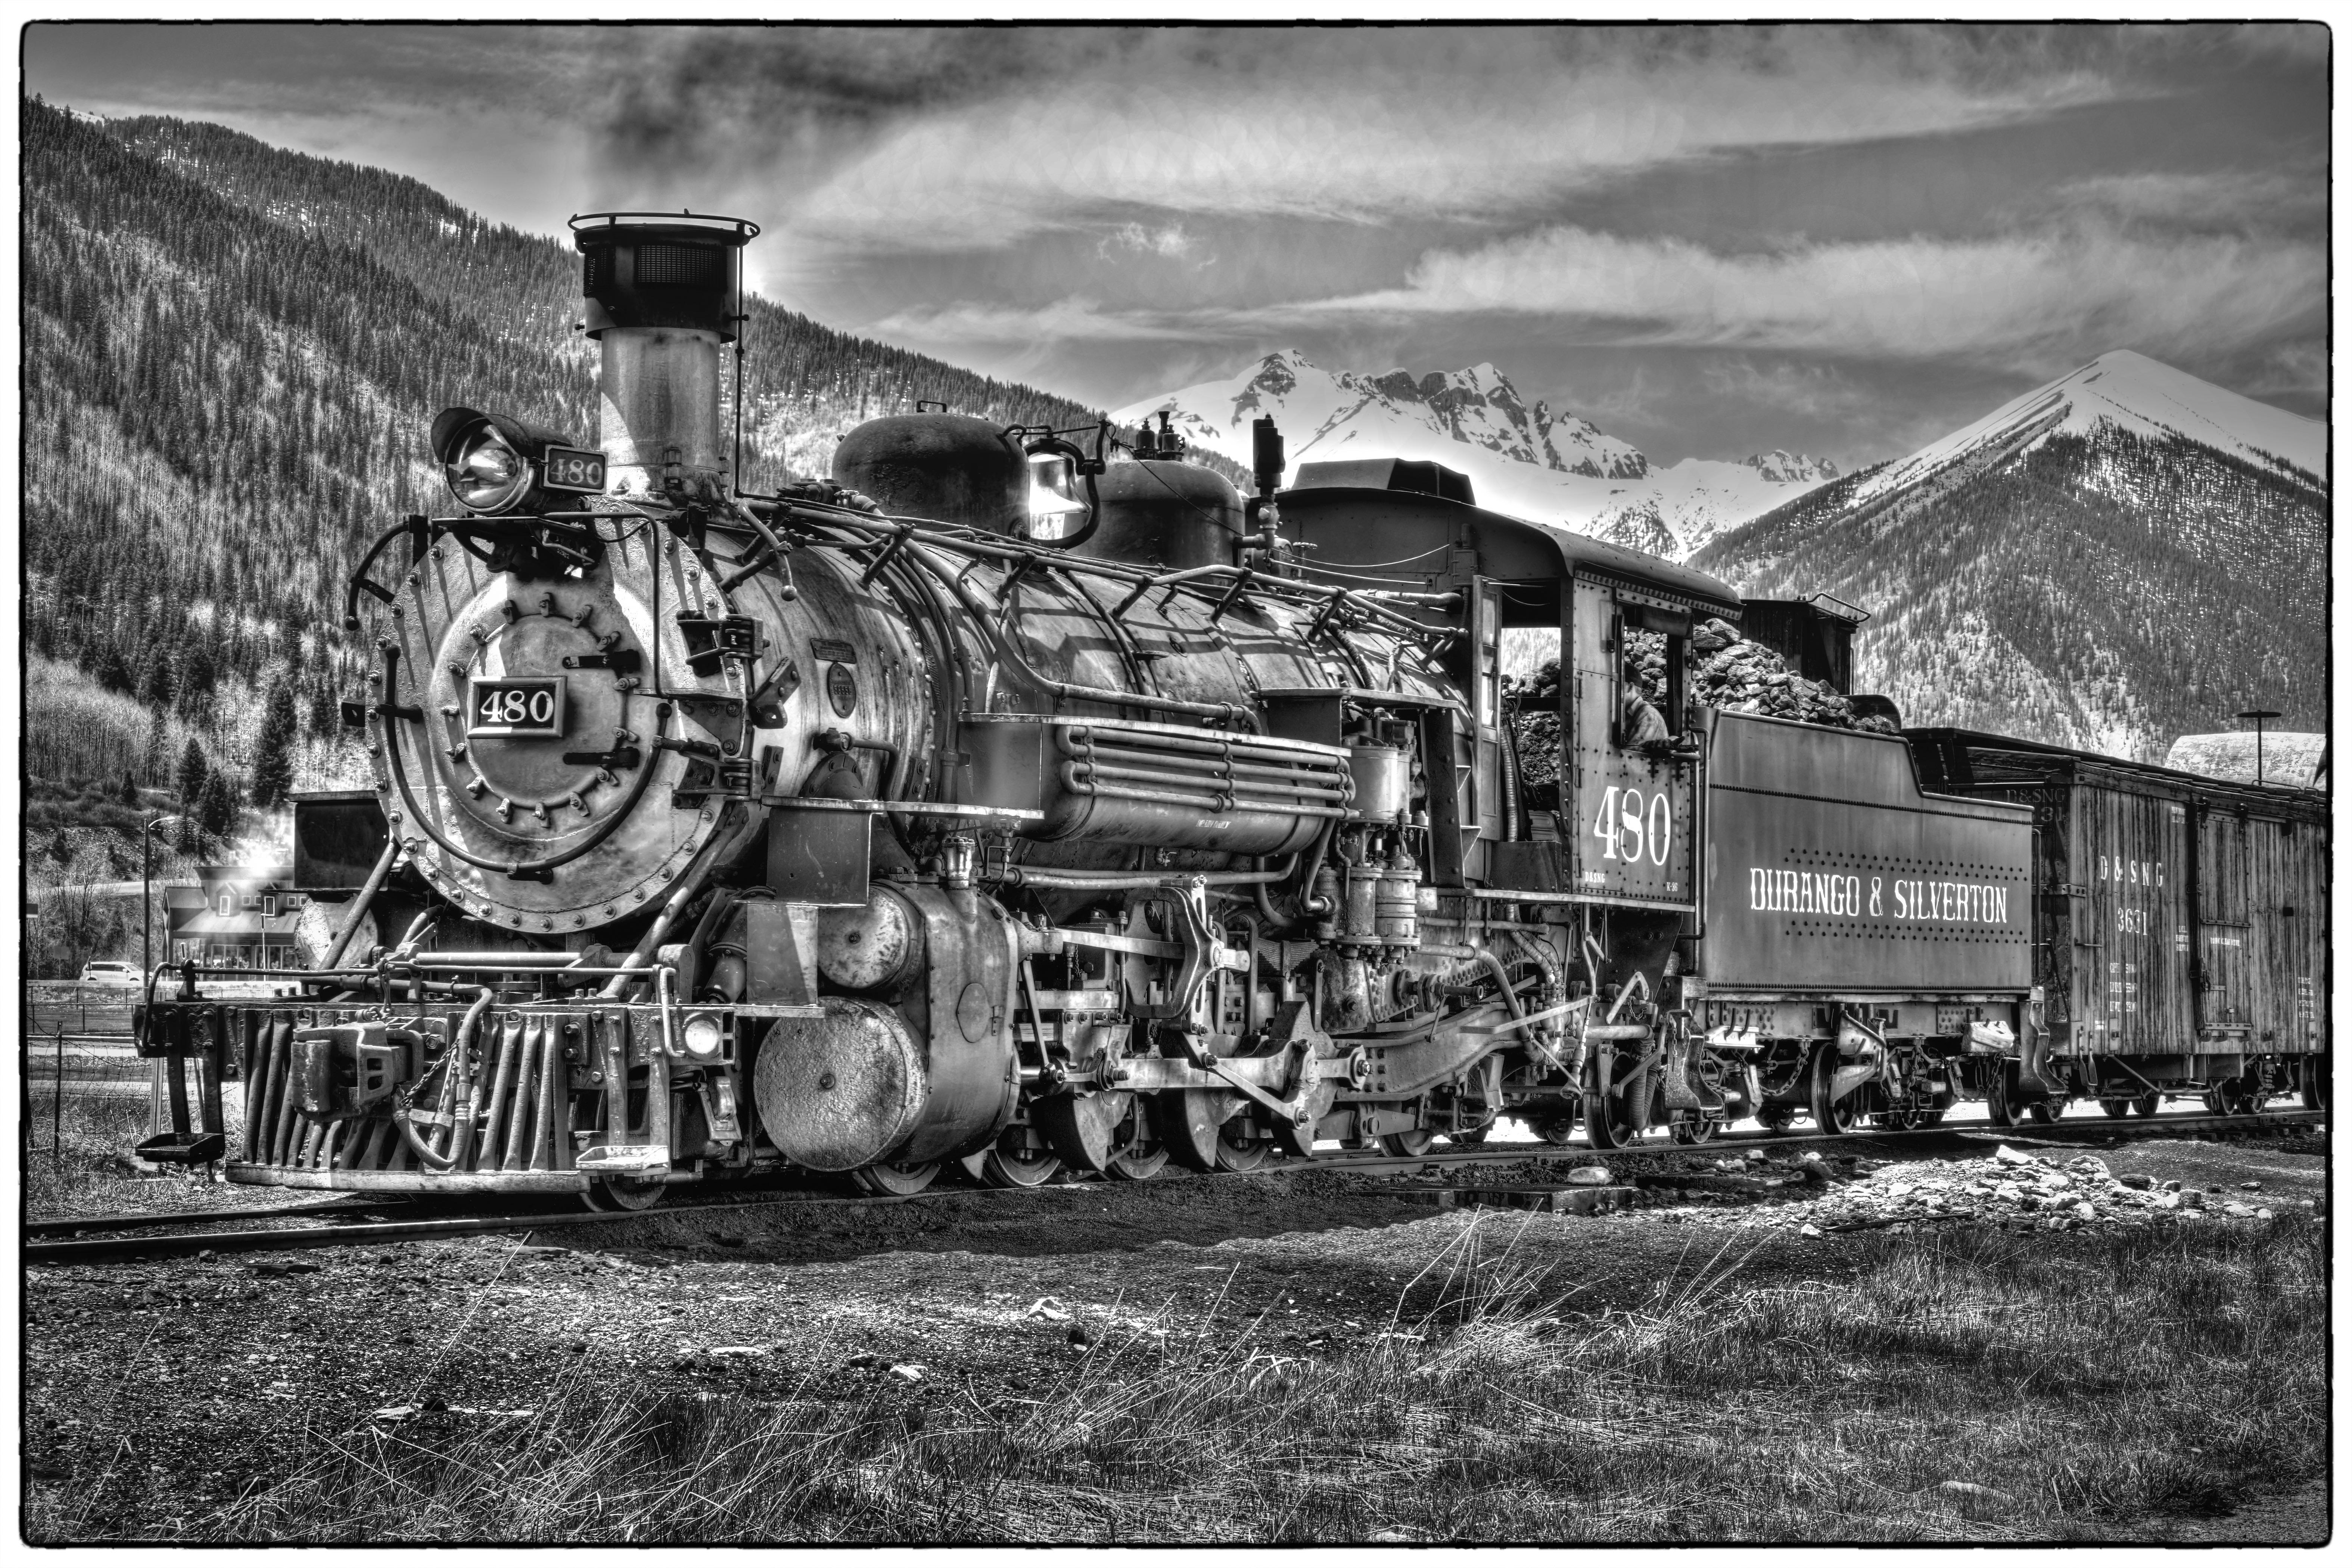 Silverton Engine 480 Monochrome